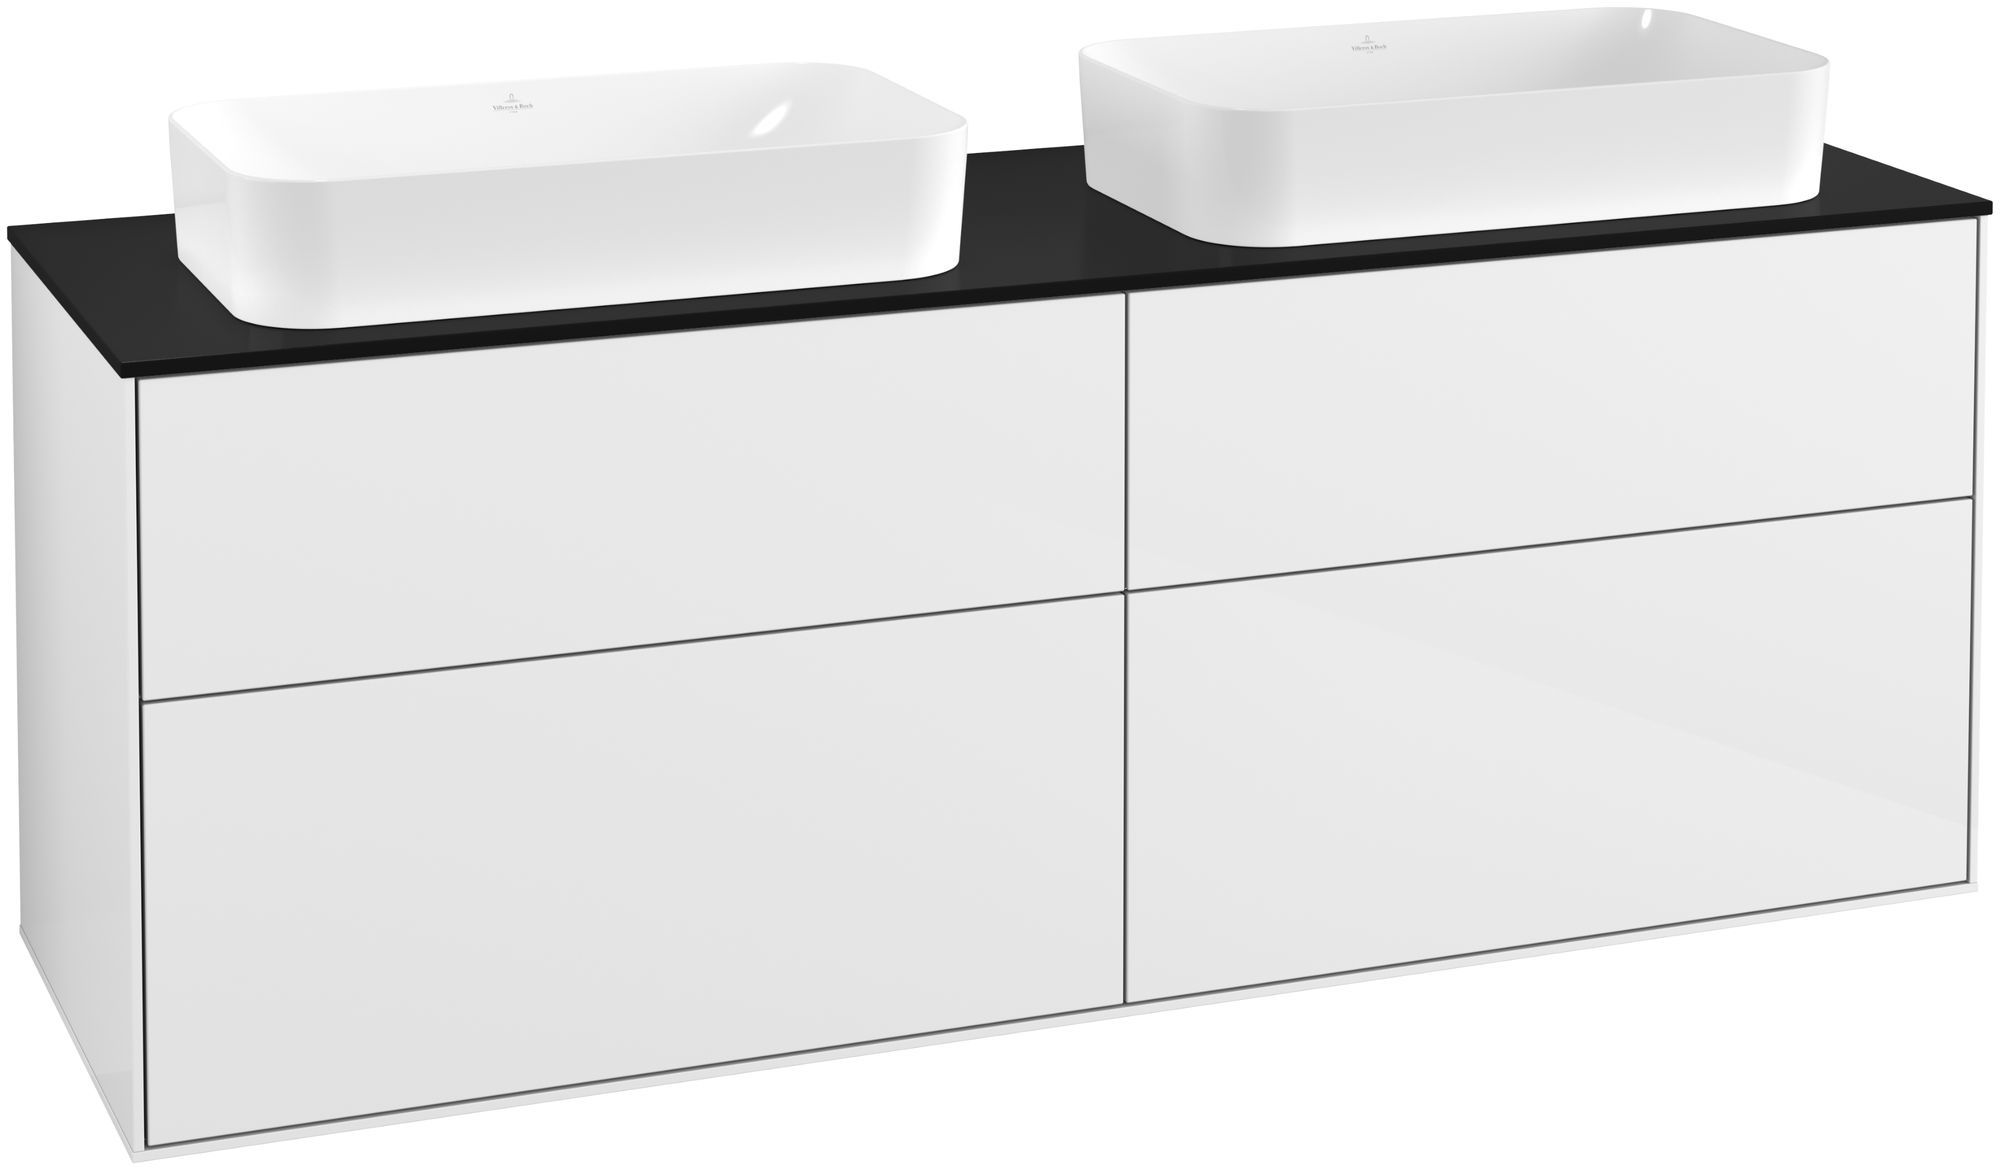 Villeroy & Boch Finion G31 Waschtischunterschrank 4 Auszüge LED-Beleuchtung B:160xH:60,3xT:50,1cm Front, Korpus: Glossy White Lack, Glasplatte: Black Matt G31200GF